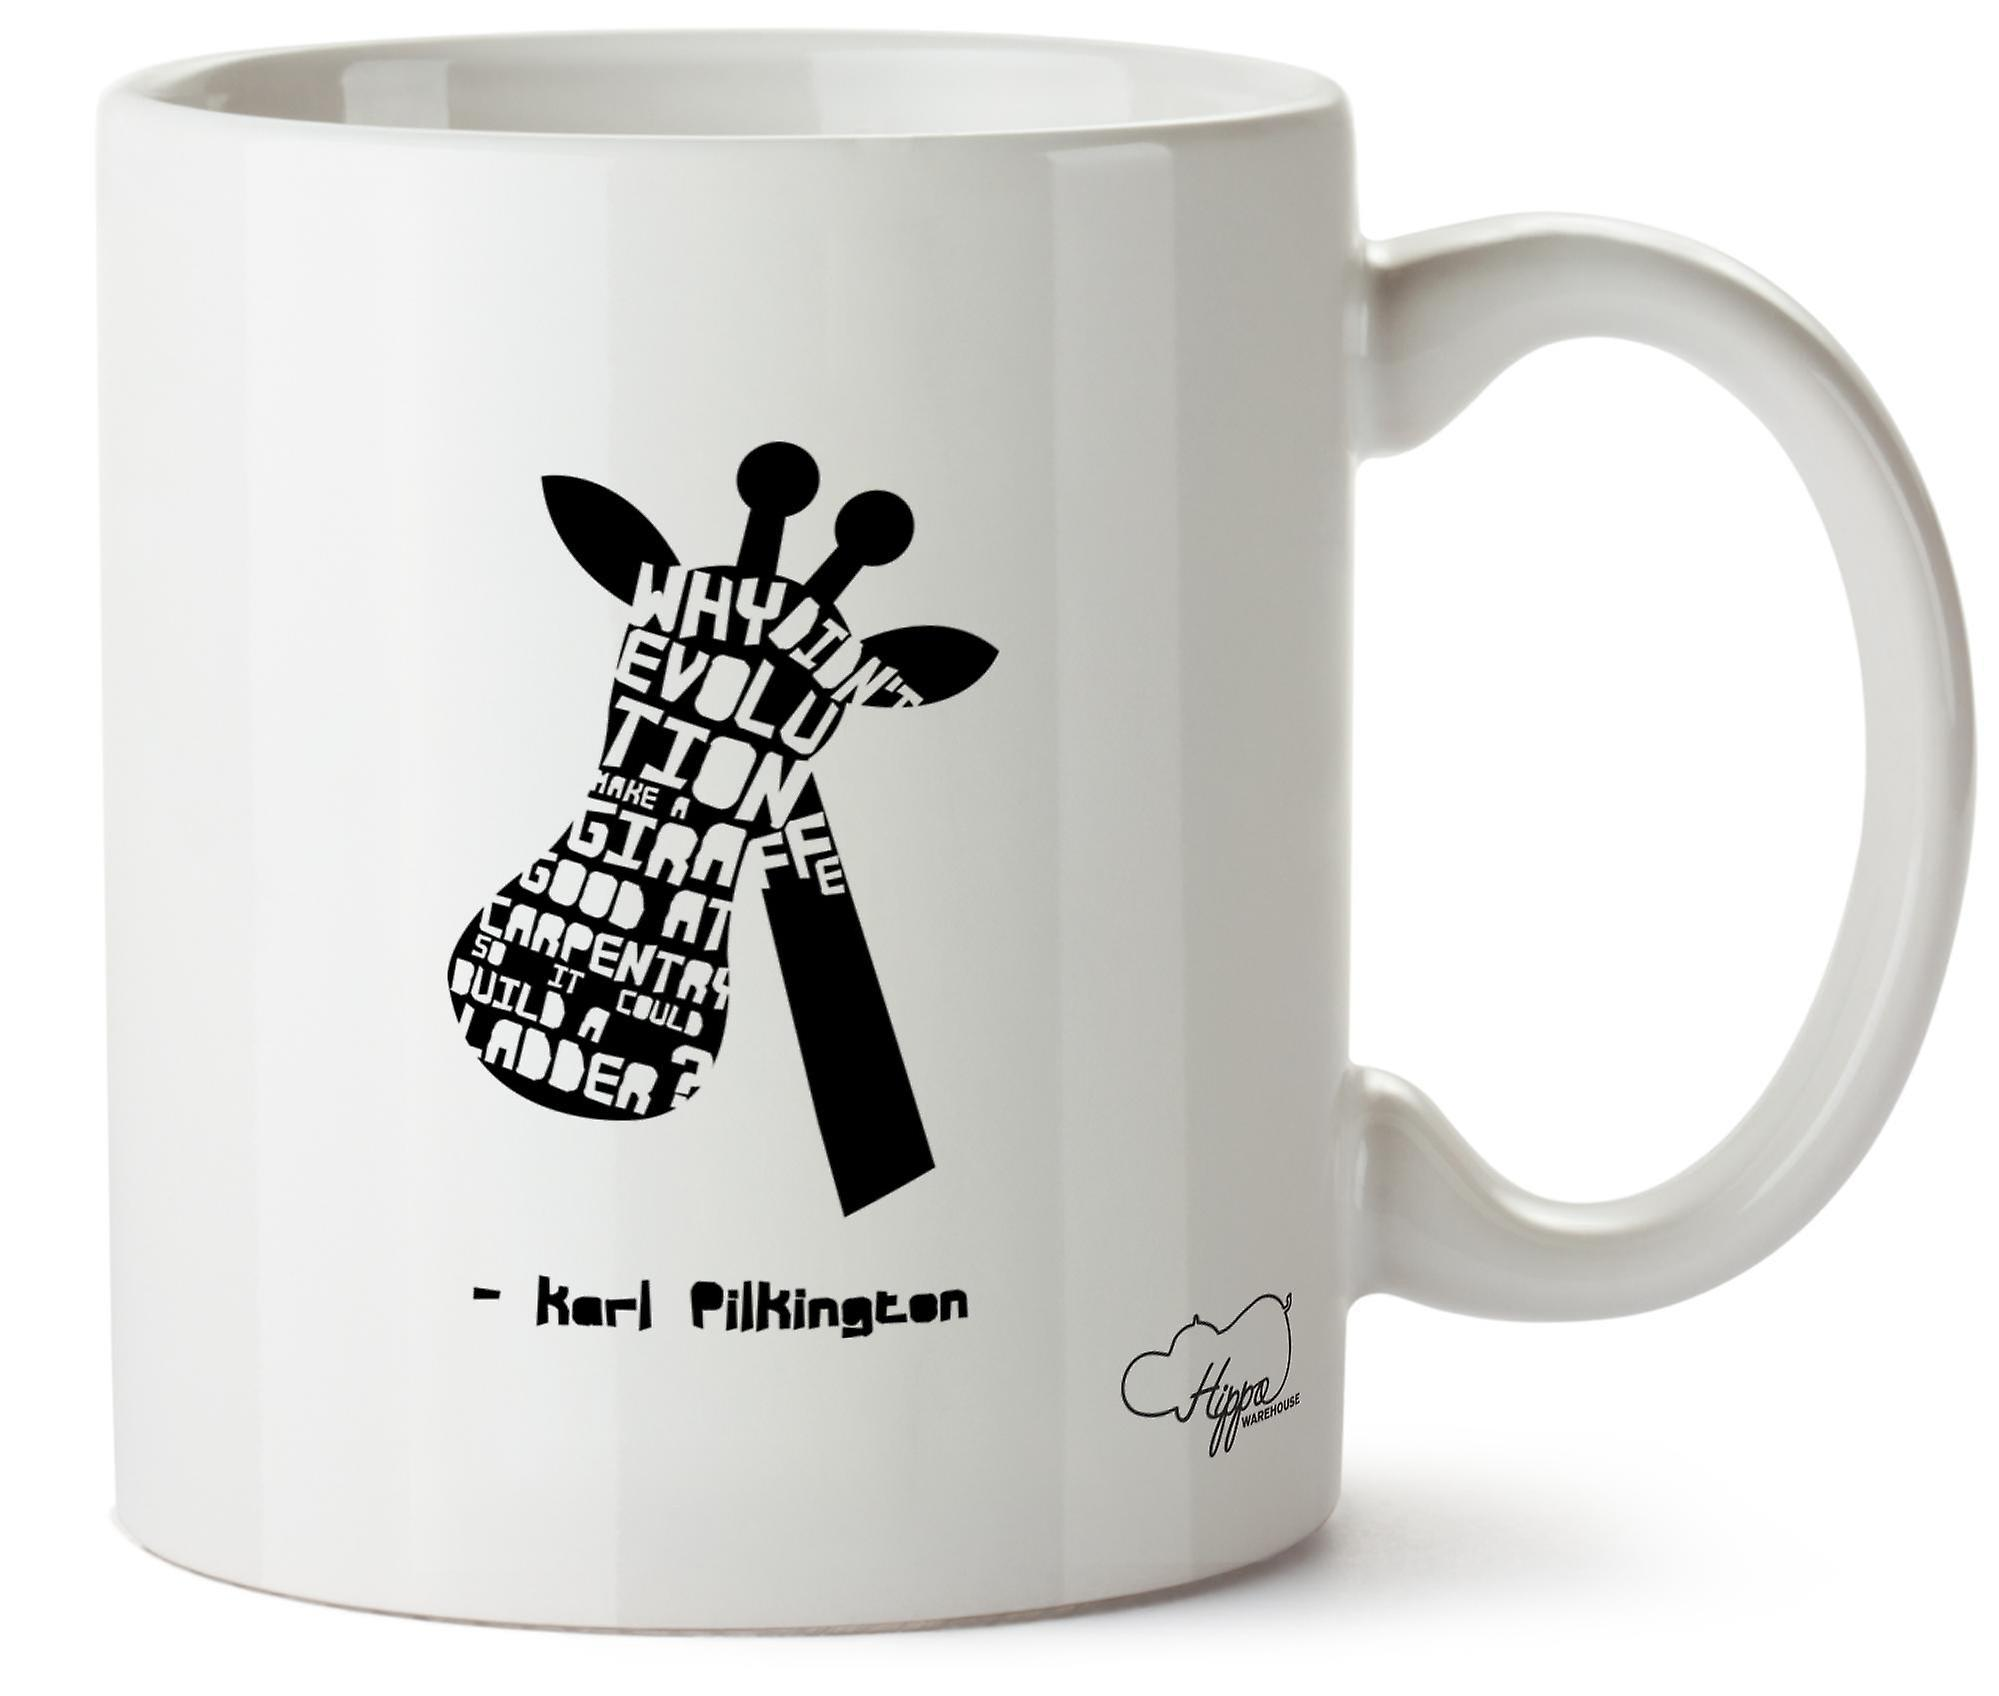 Hippowarehouse Why Didn't  Evolution Make A Giraffe Good At Carpentry So It Could Build A Ladder? Printed Mug Cup Ceramic 10oz